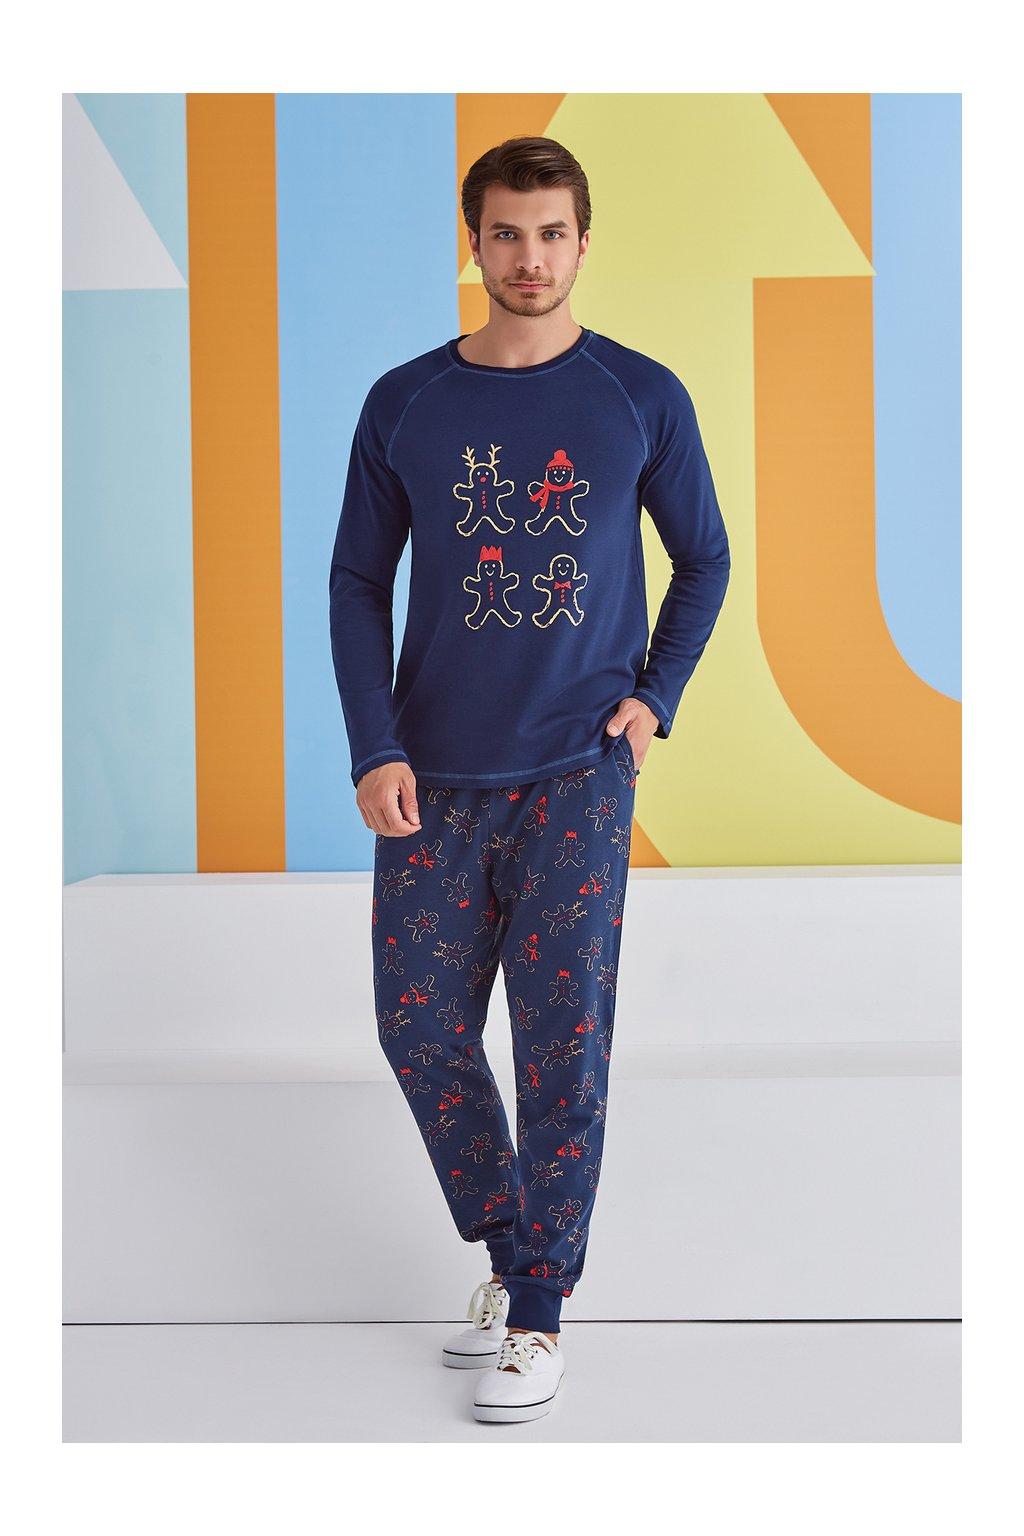 Pánské pyžamo s perníčky